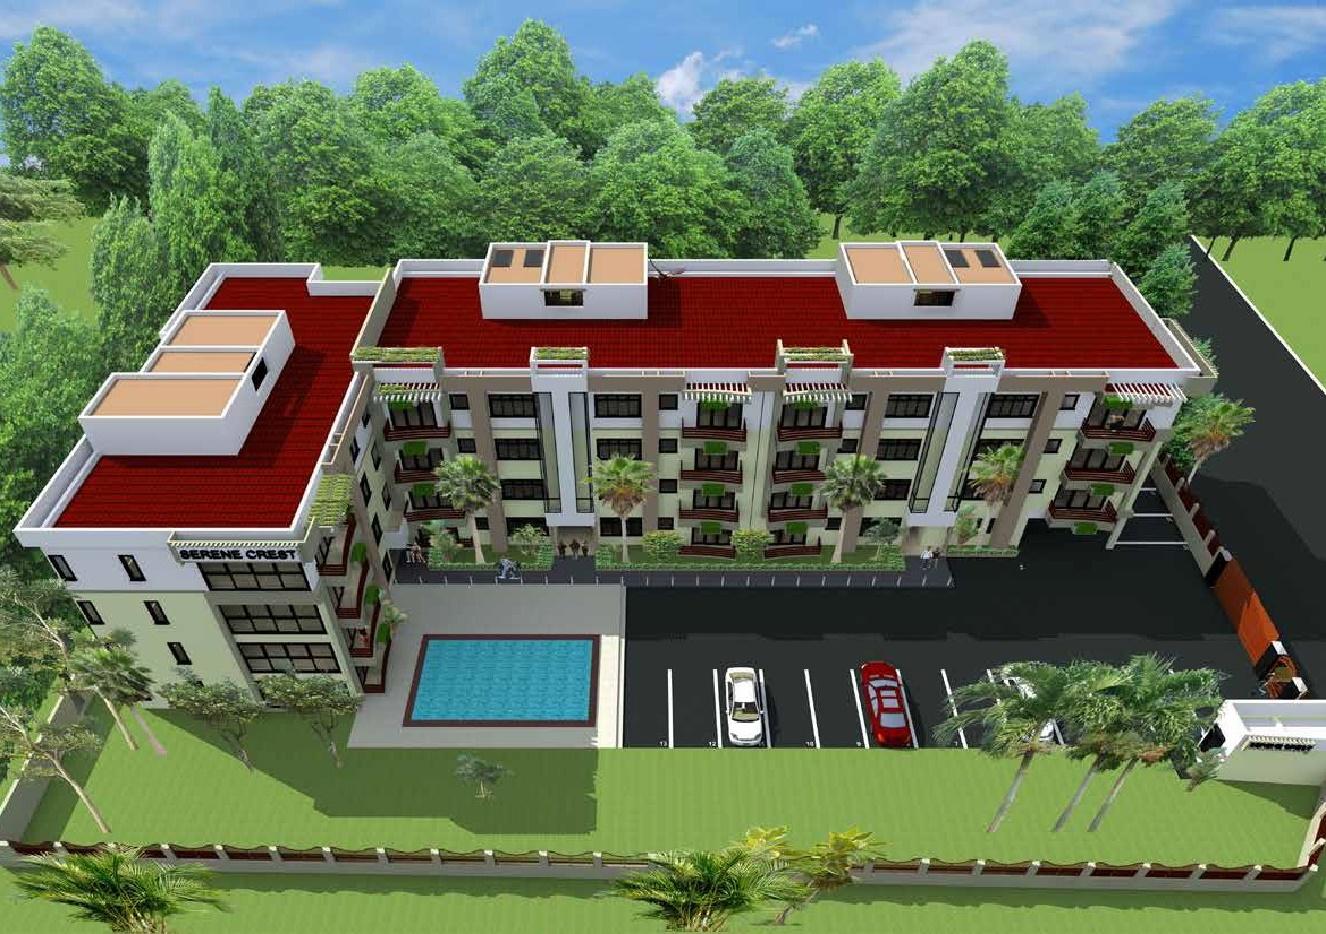 SERENE CREST APARTMENTS-KIGALI, RWANDA